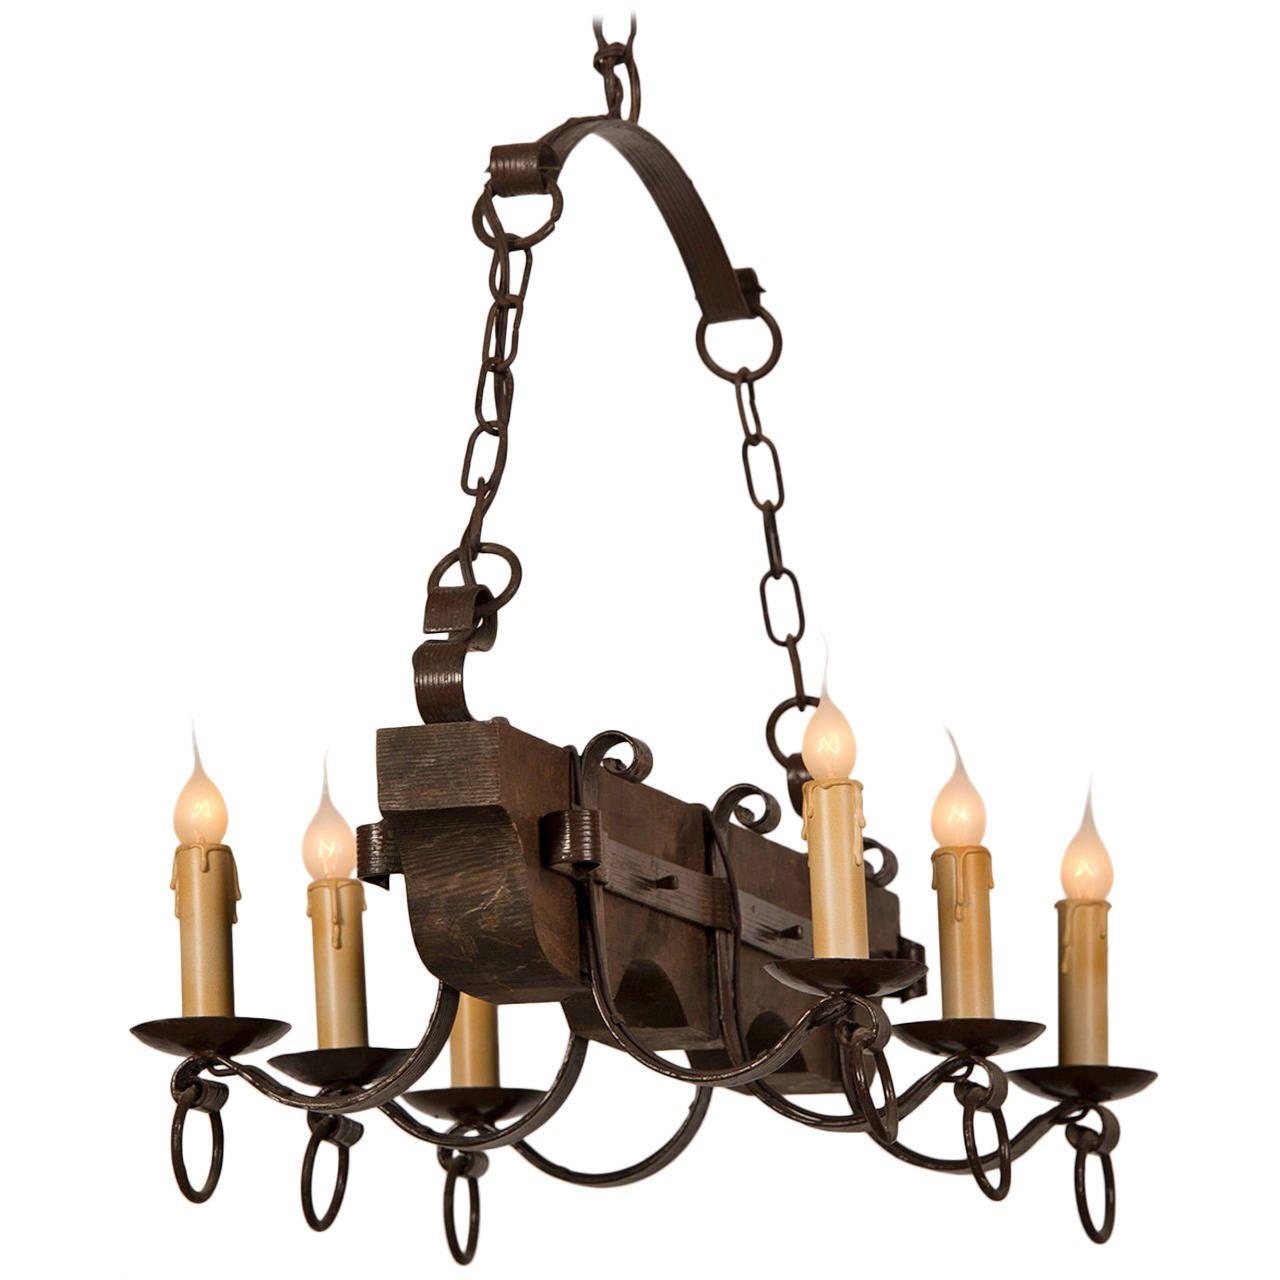 Vintage french painted wood and iron ox yoke chandelier circa 1940 vintage french painted wood and iron ox yoke chandelier circa 1940 arubaitofo Image collections